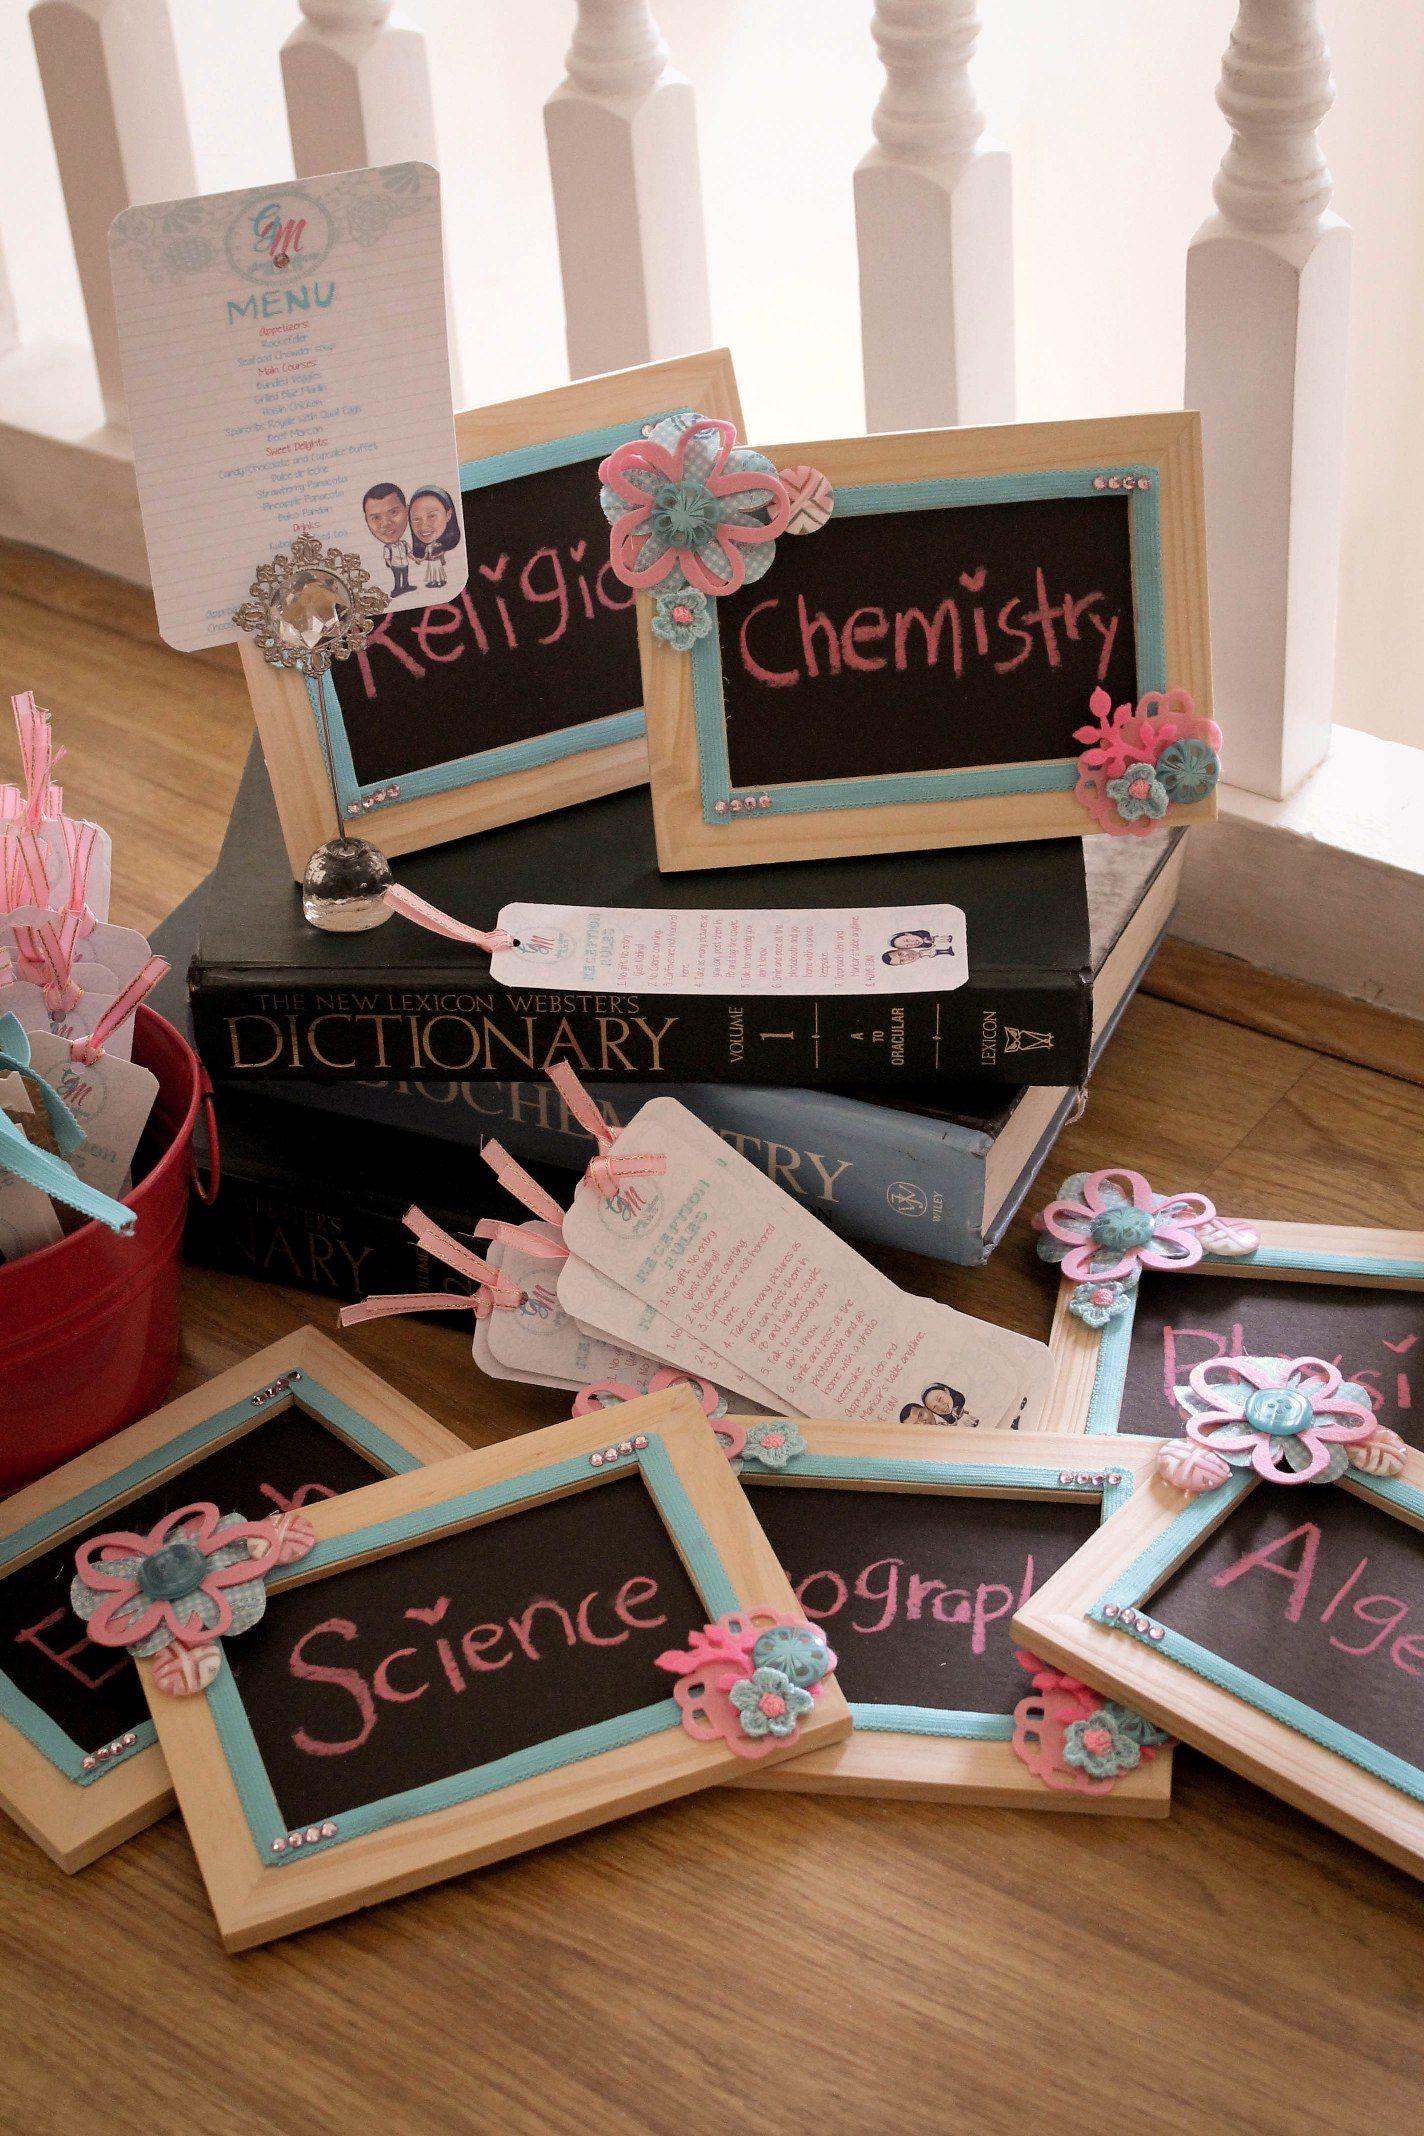 School Theme Chalkboard Table Names Cheap Wedding Ideas On A Budget